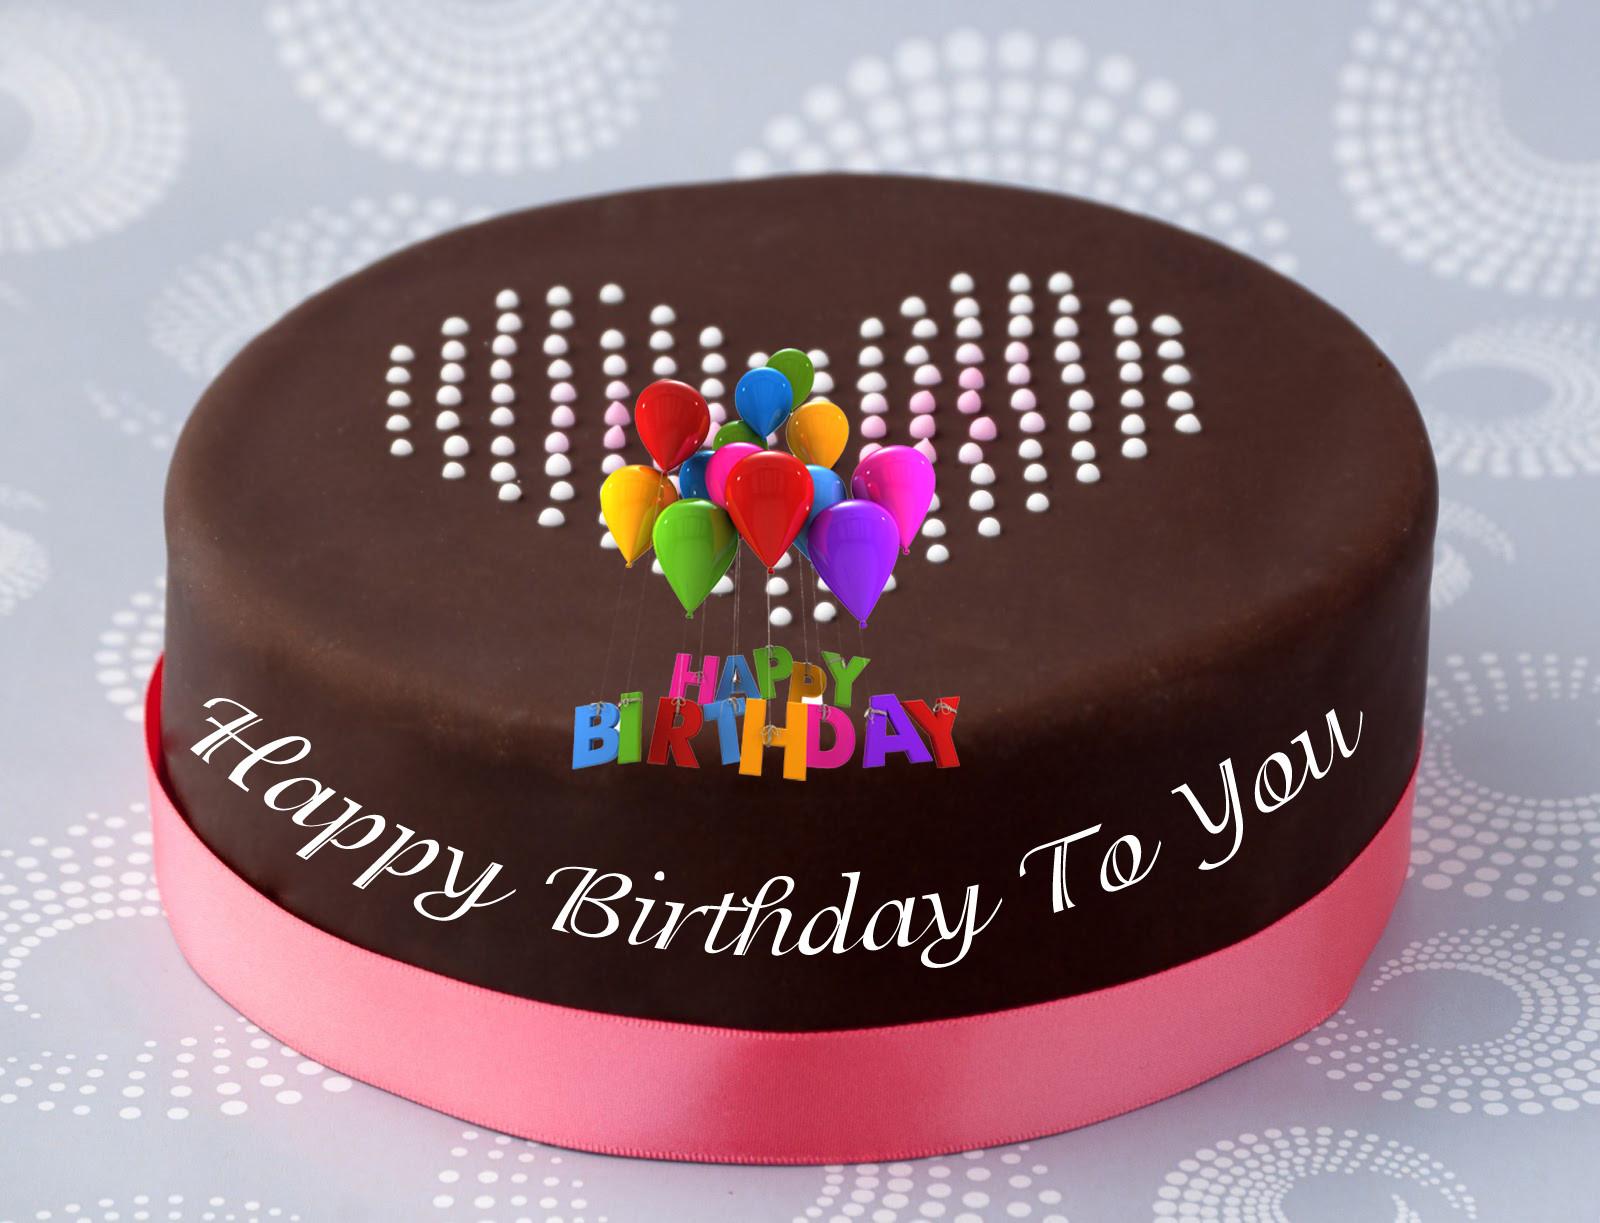 Happy Birthday Cake Images  birthday wishes Free